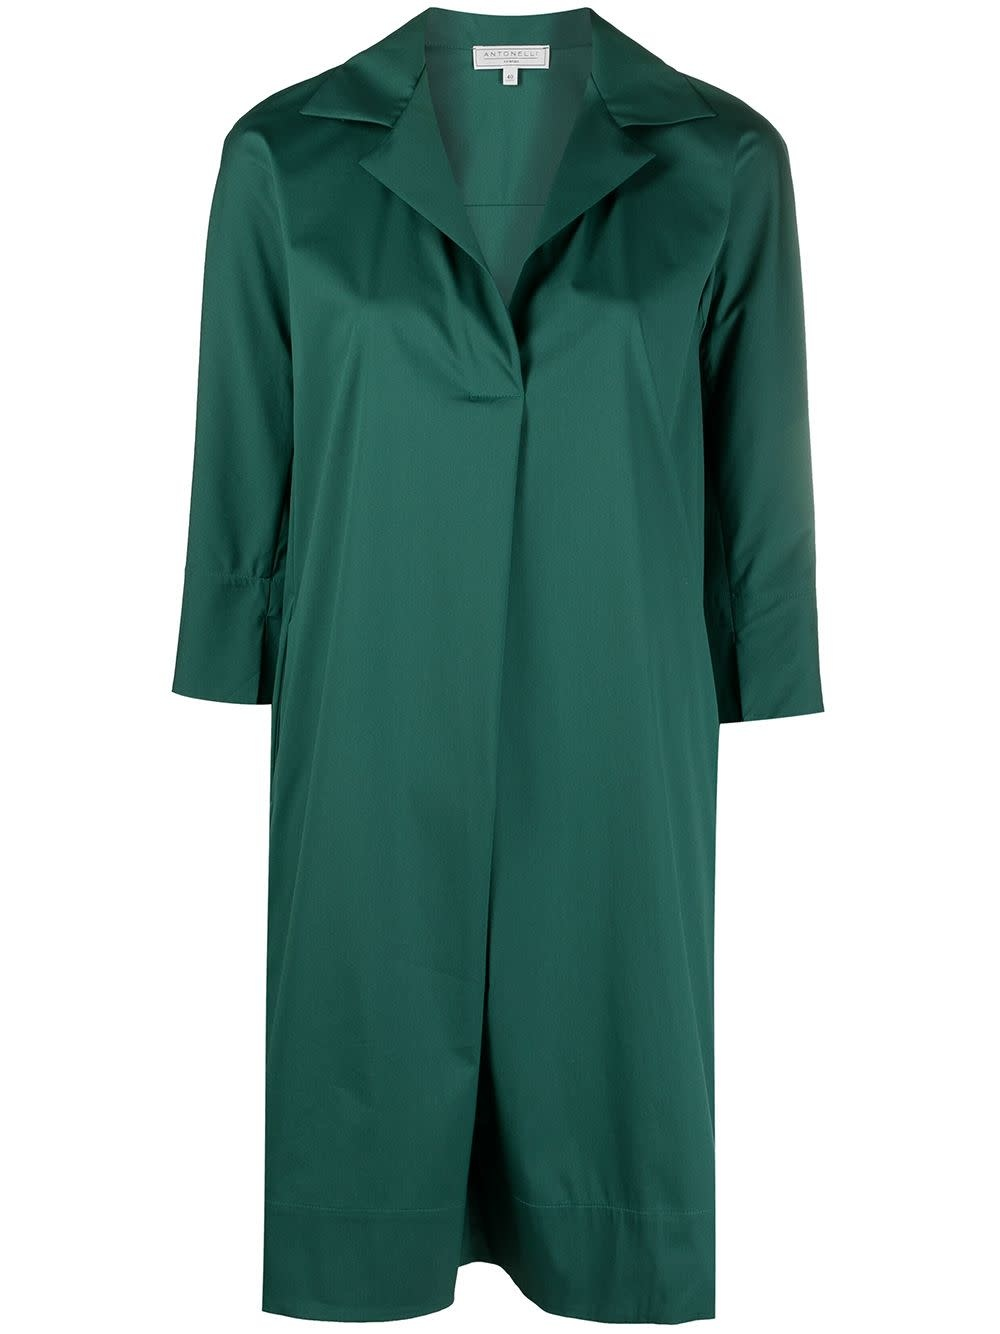 Melania dress antonelli-1